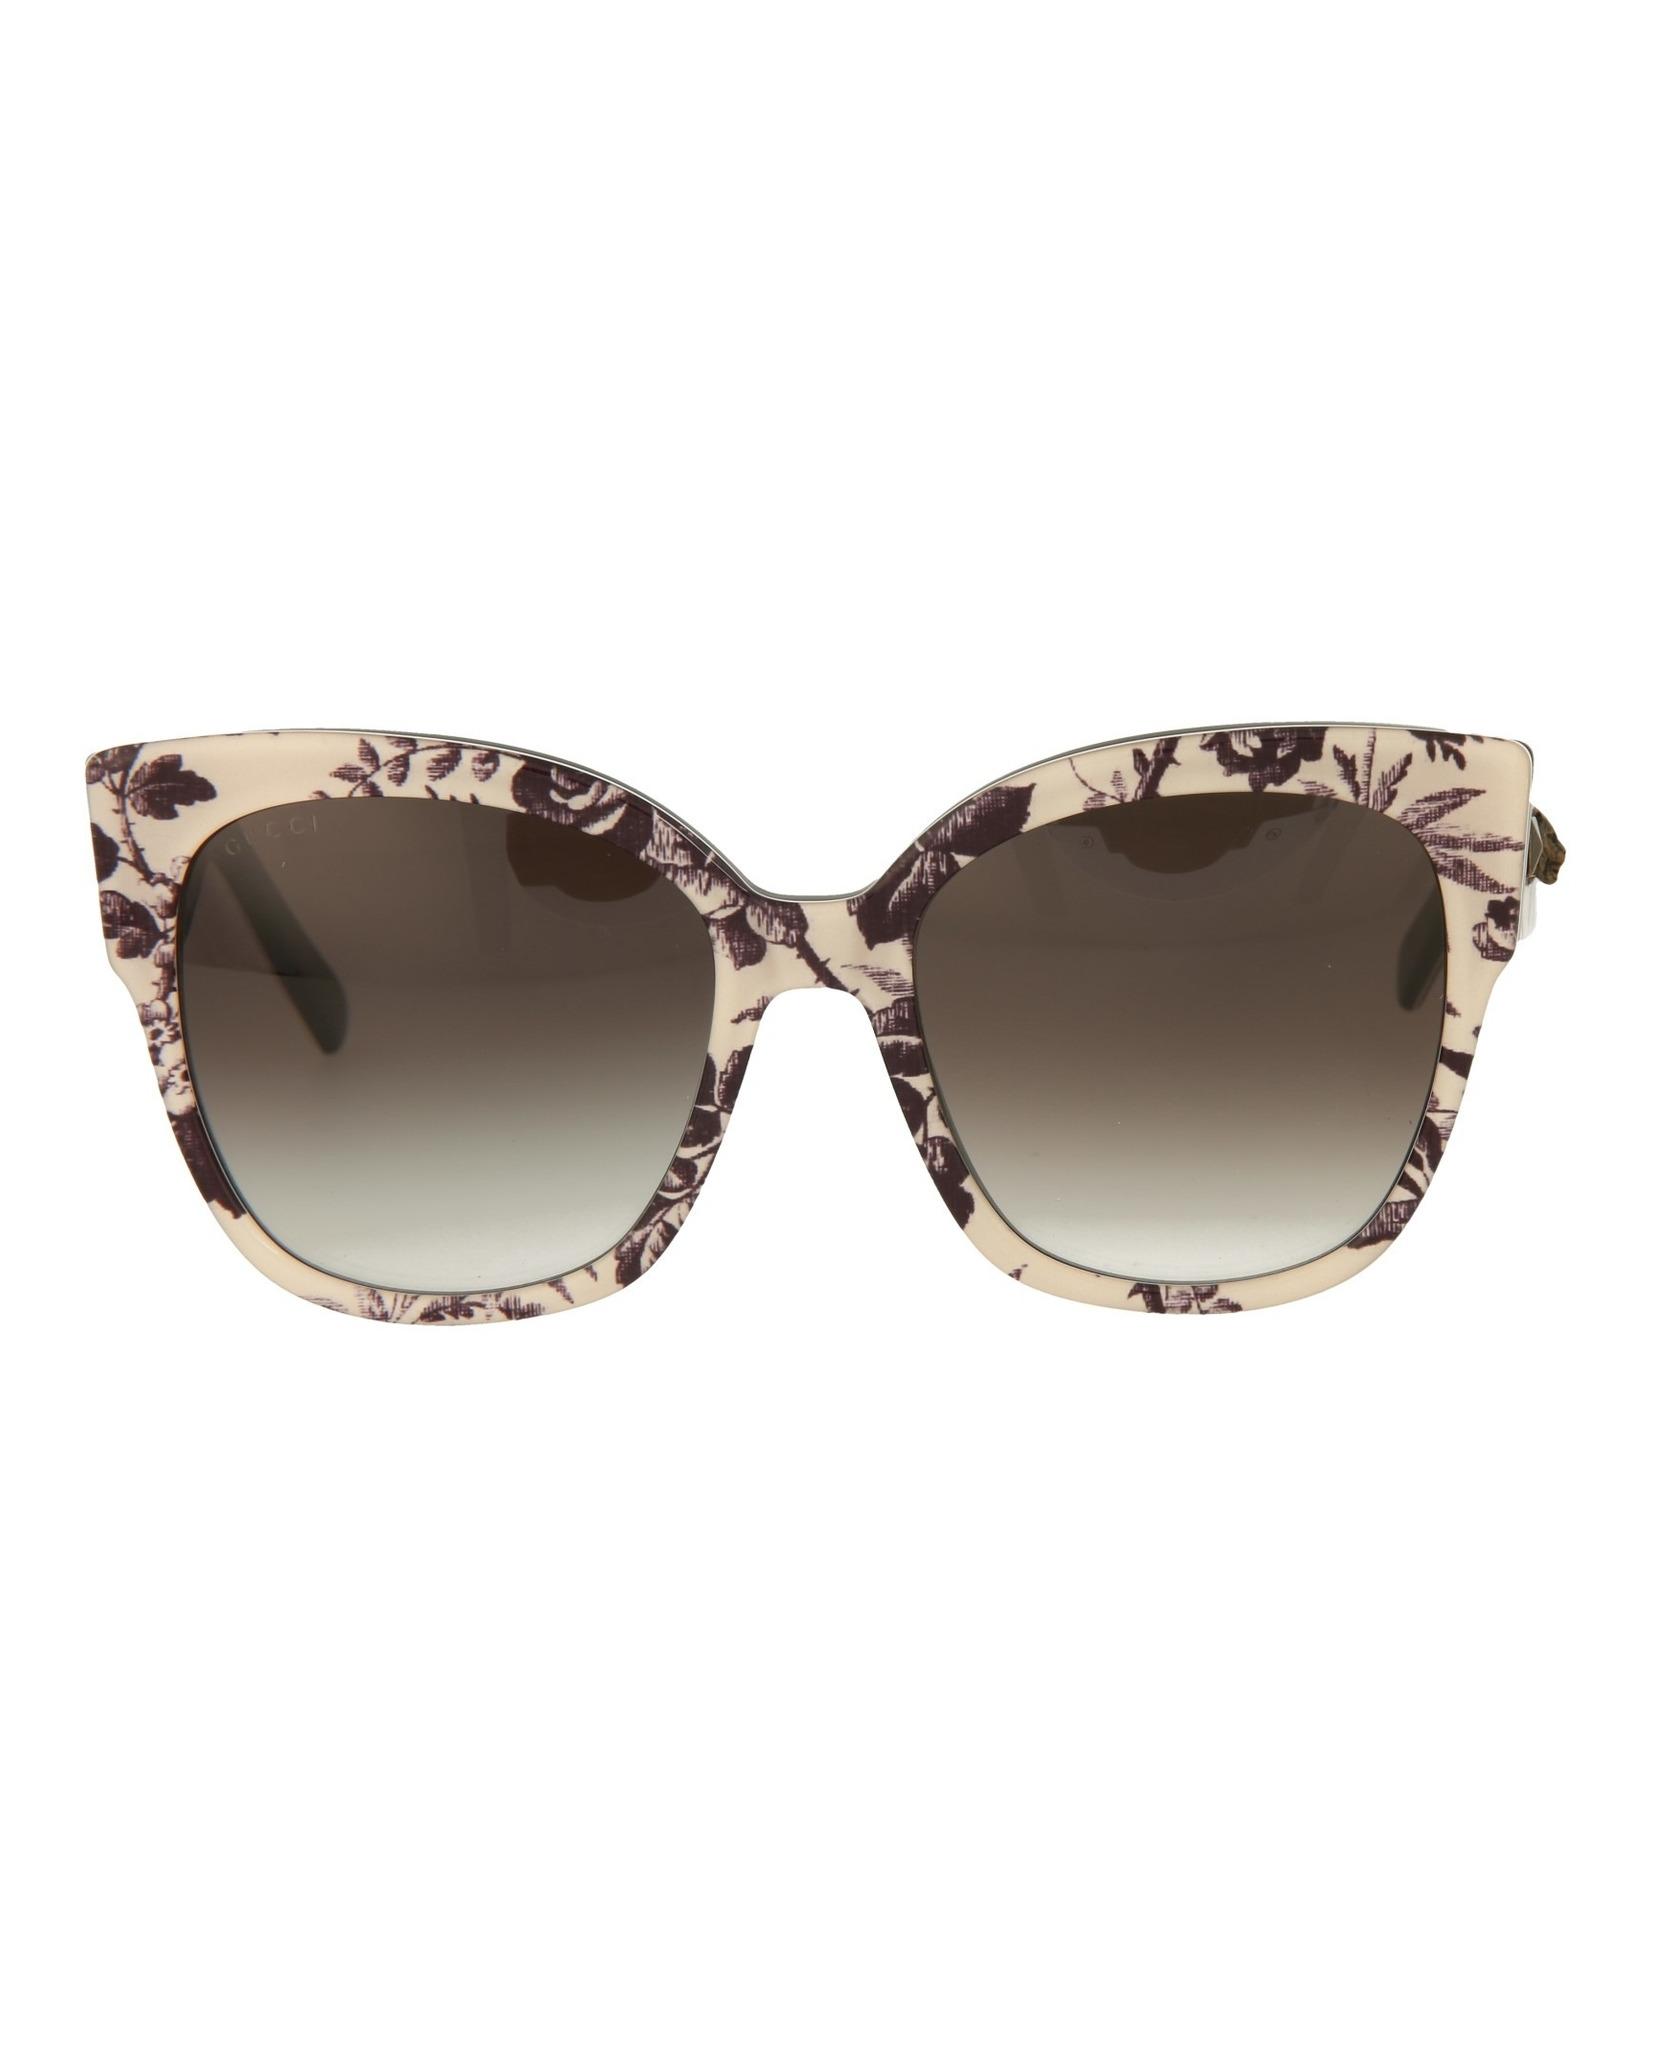 7fe1cf9ee4 Gucci Womens Square Rectangle Sunglasses GG0059S-30001027-004 ...